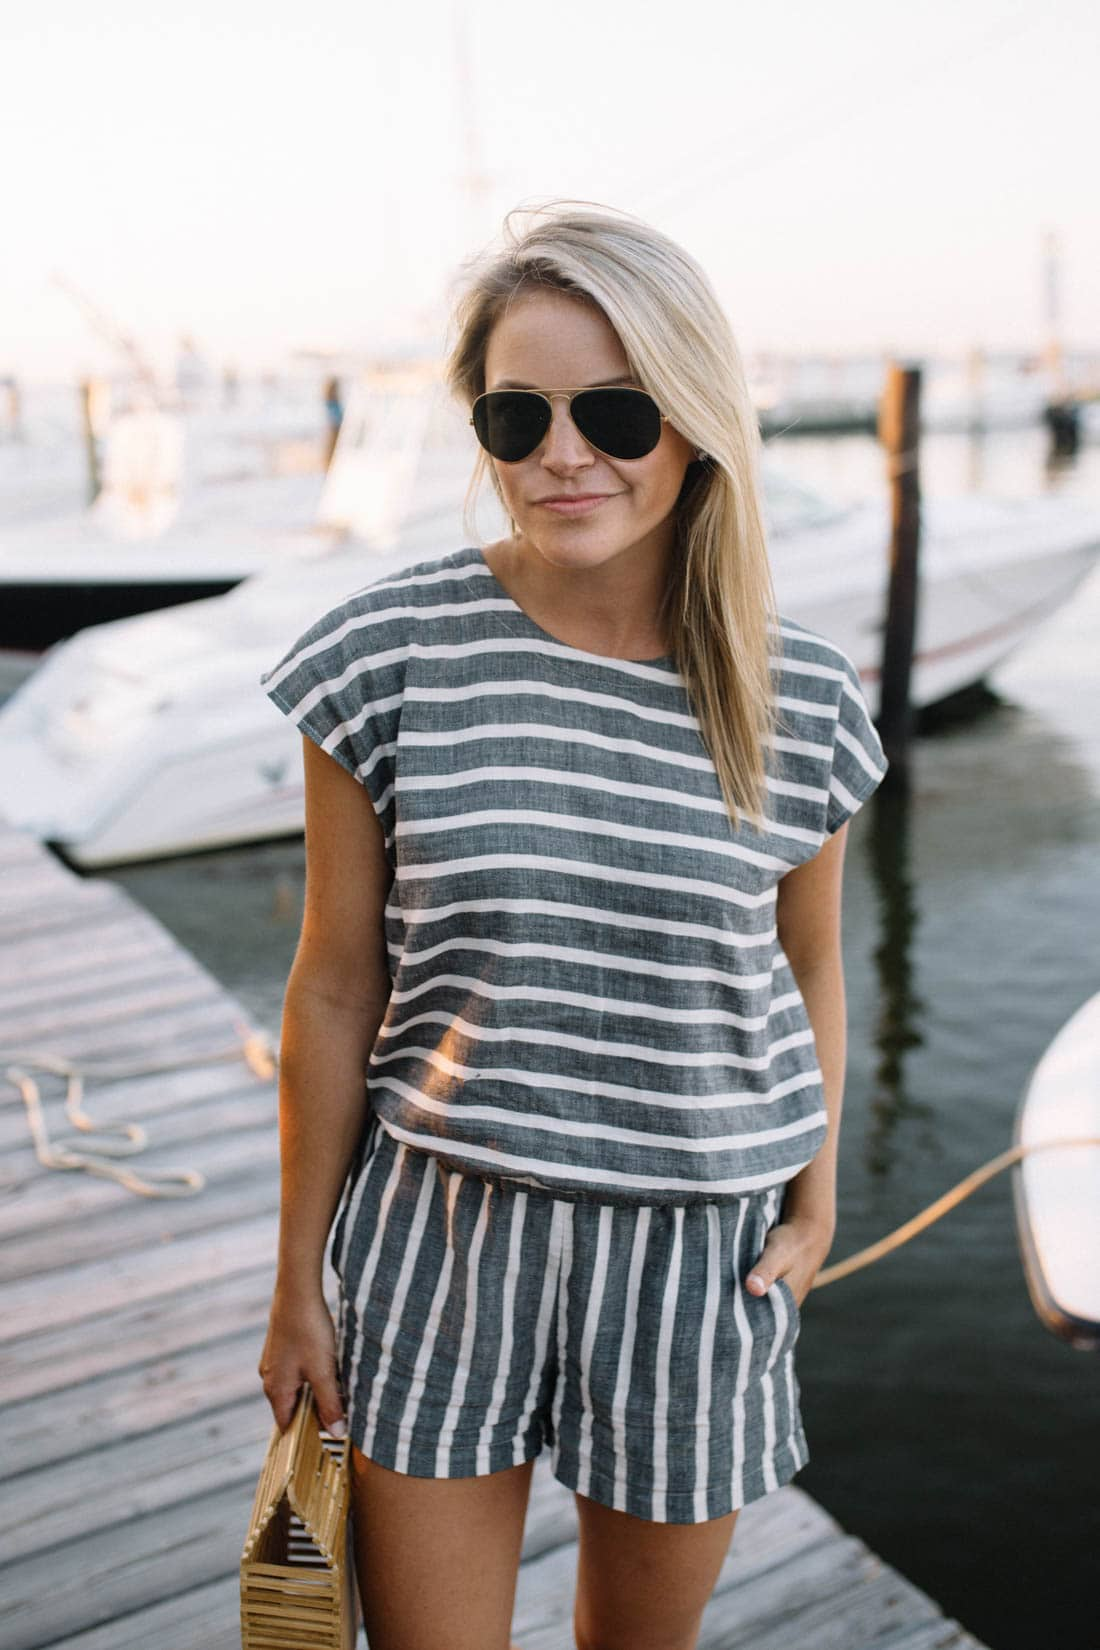 Lou & Grey Striped Tie Back Romper